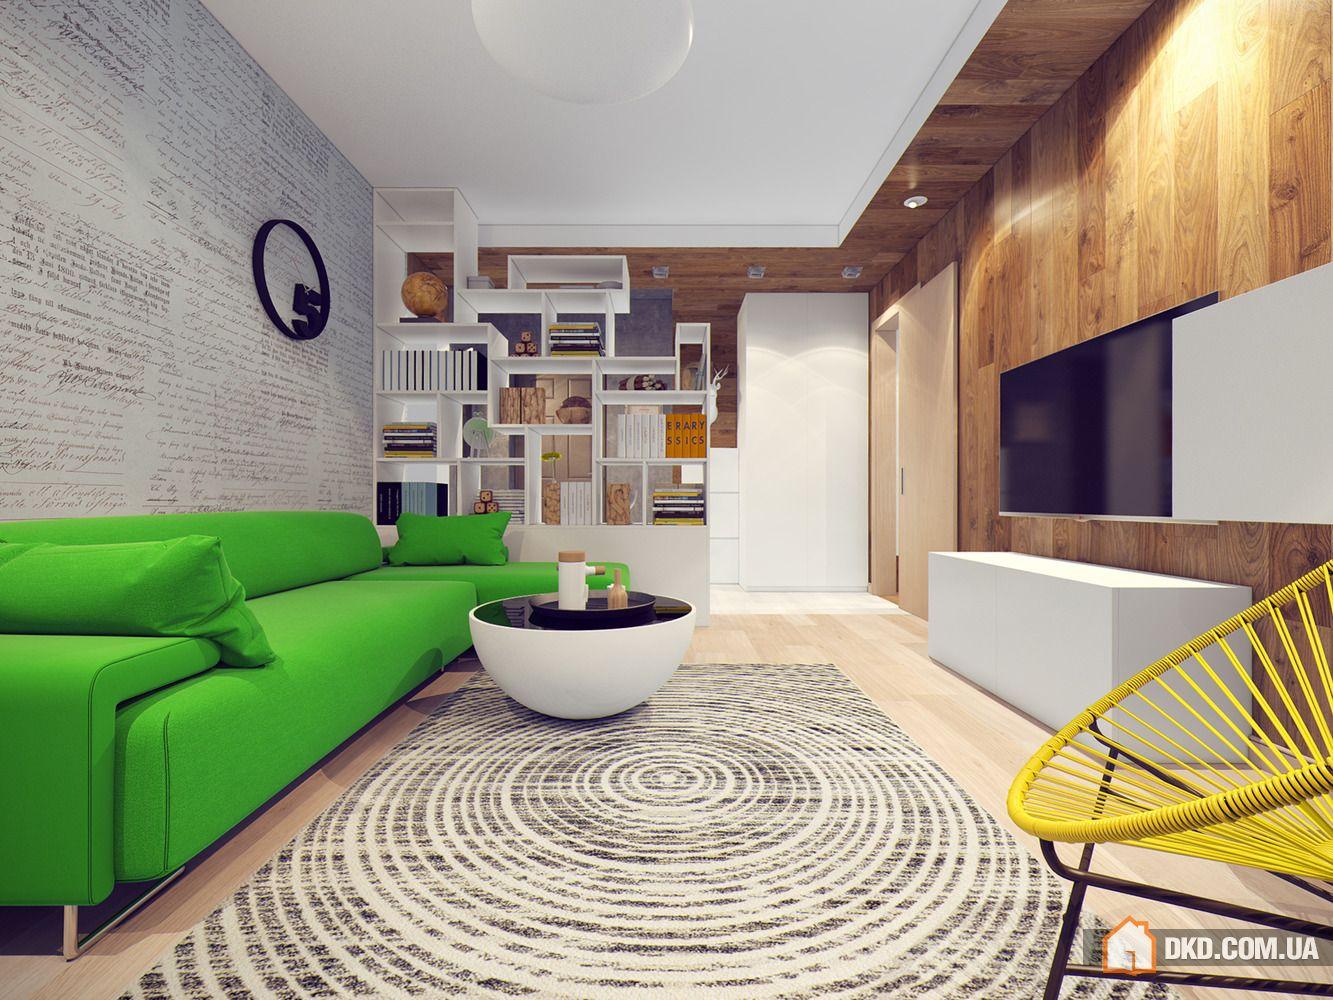 Дизайн квартиры 56 кв м фото